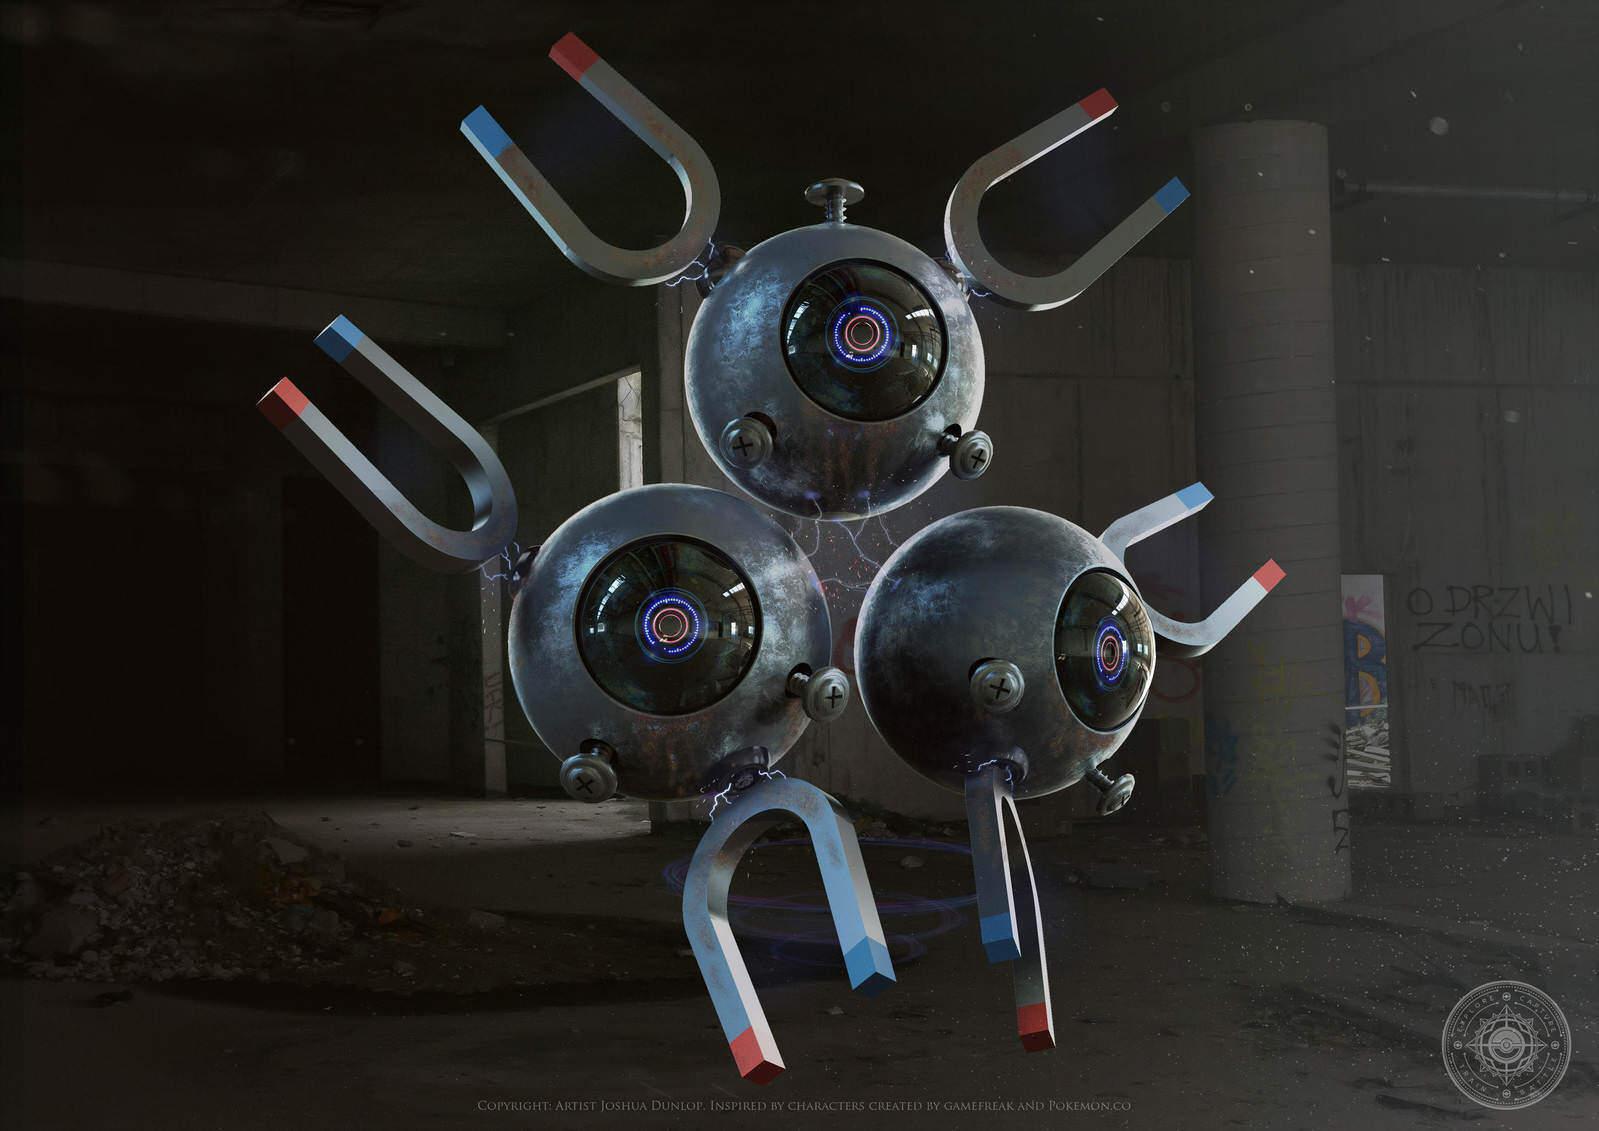 Magneton by joshuadunlop dclazr4 fullview